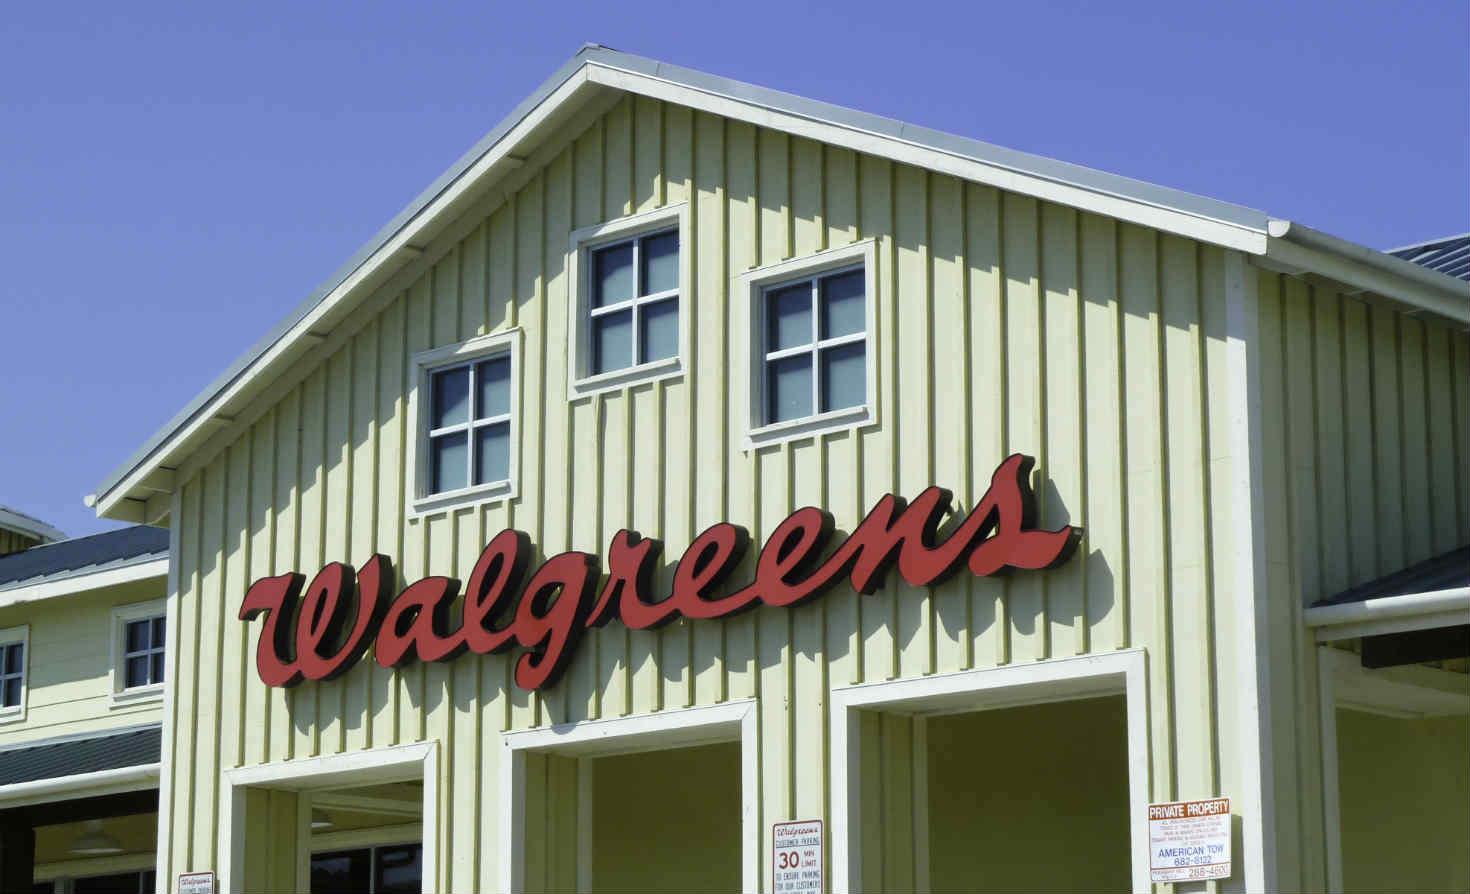 Walgreens store in Pleasant Hill, California